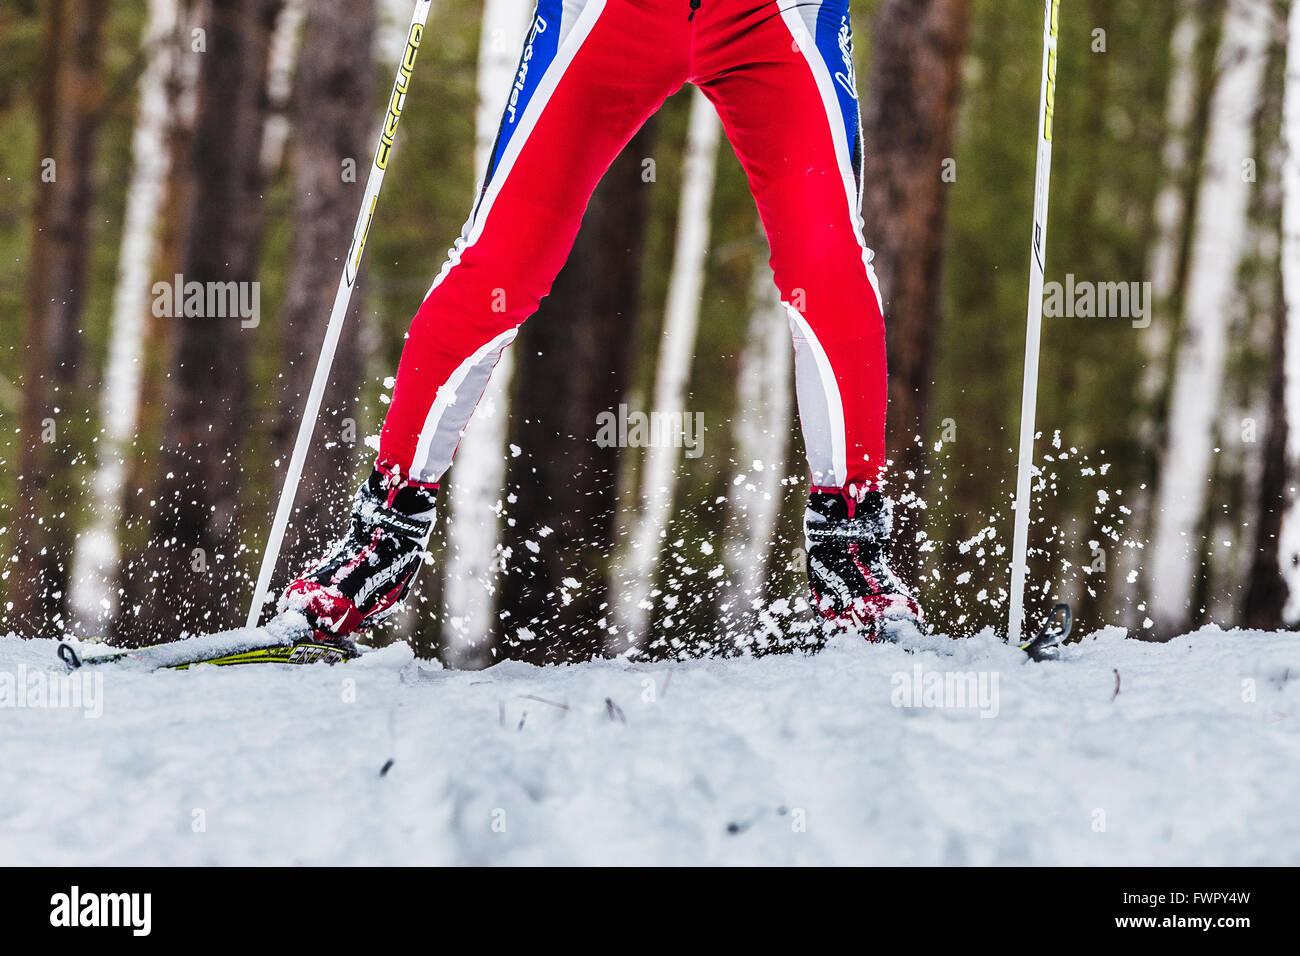 Kyshtym, Rusia - Marzo 26, 2016: closeup pie esquiador masculina aerosoles de nieve bajo durante campeonato de esquí Imagen De Stock